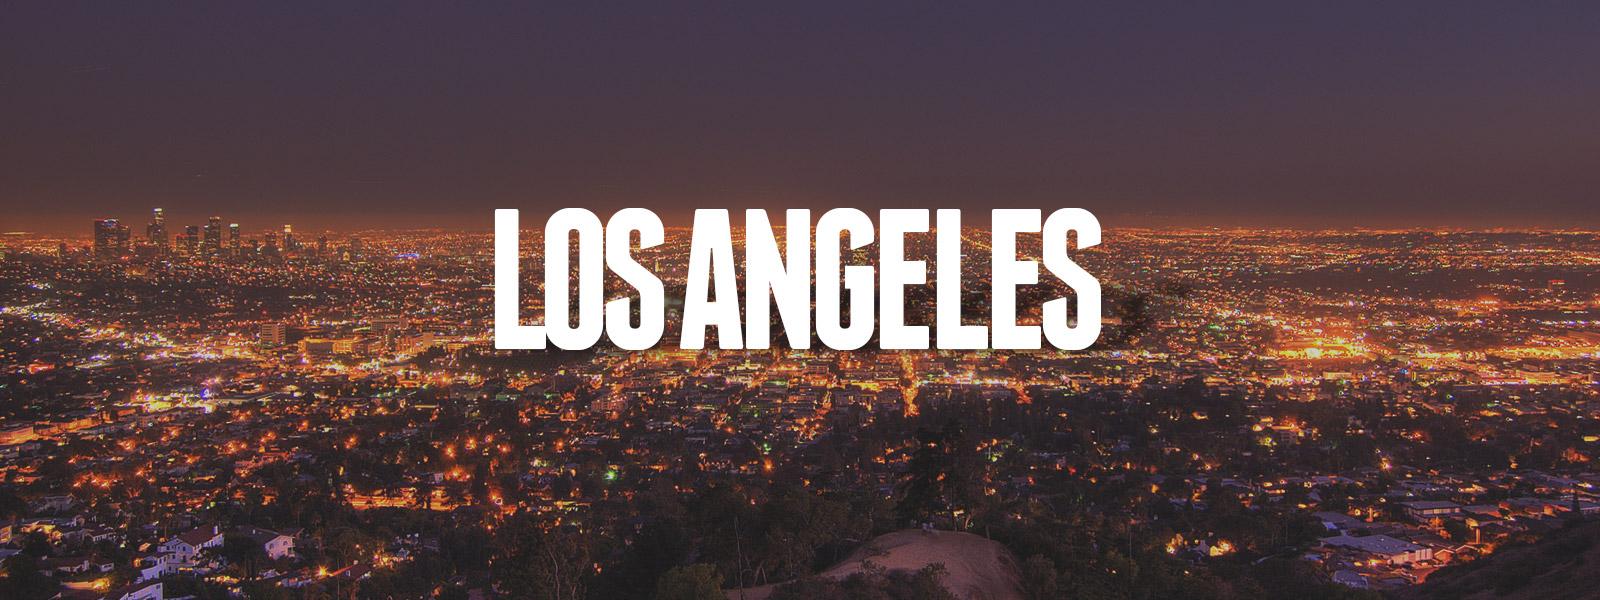 chuyen-phat-nhanh-di-Los-Angeles